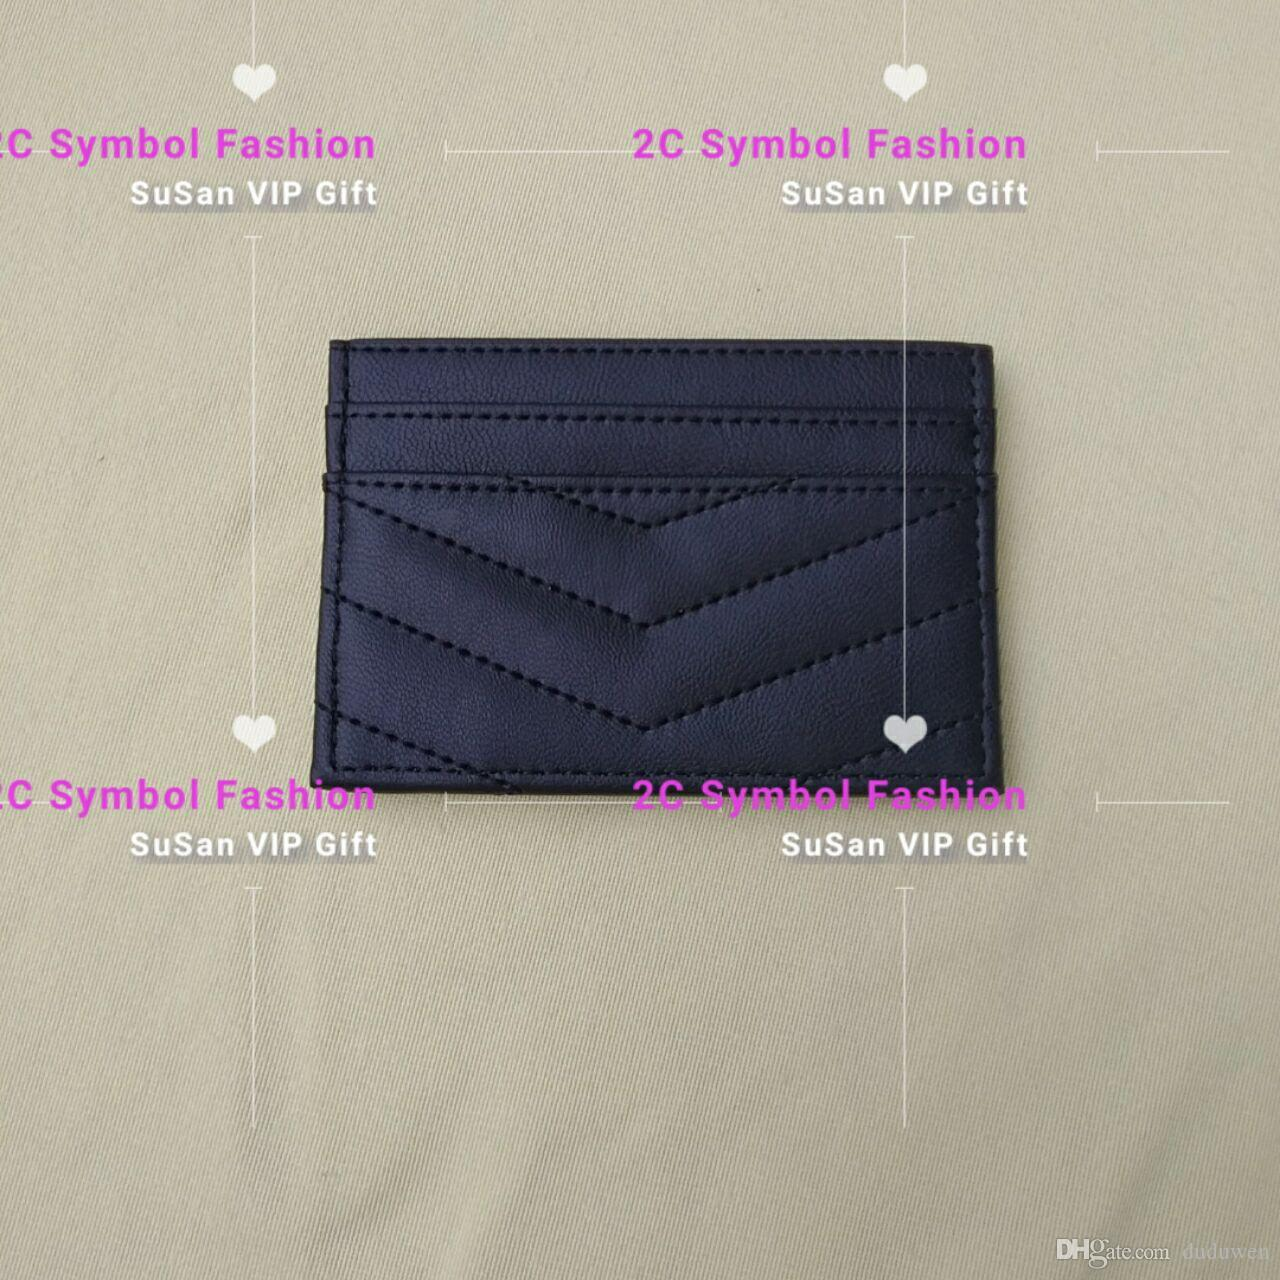 Striped pattern fashion brand mini wallet ID card holder fashion store bag counter gift plastic bag